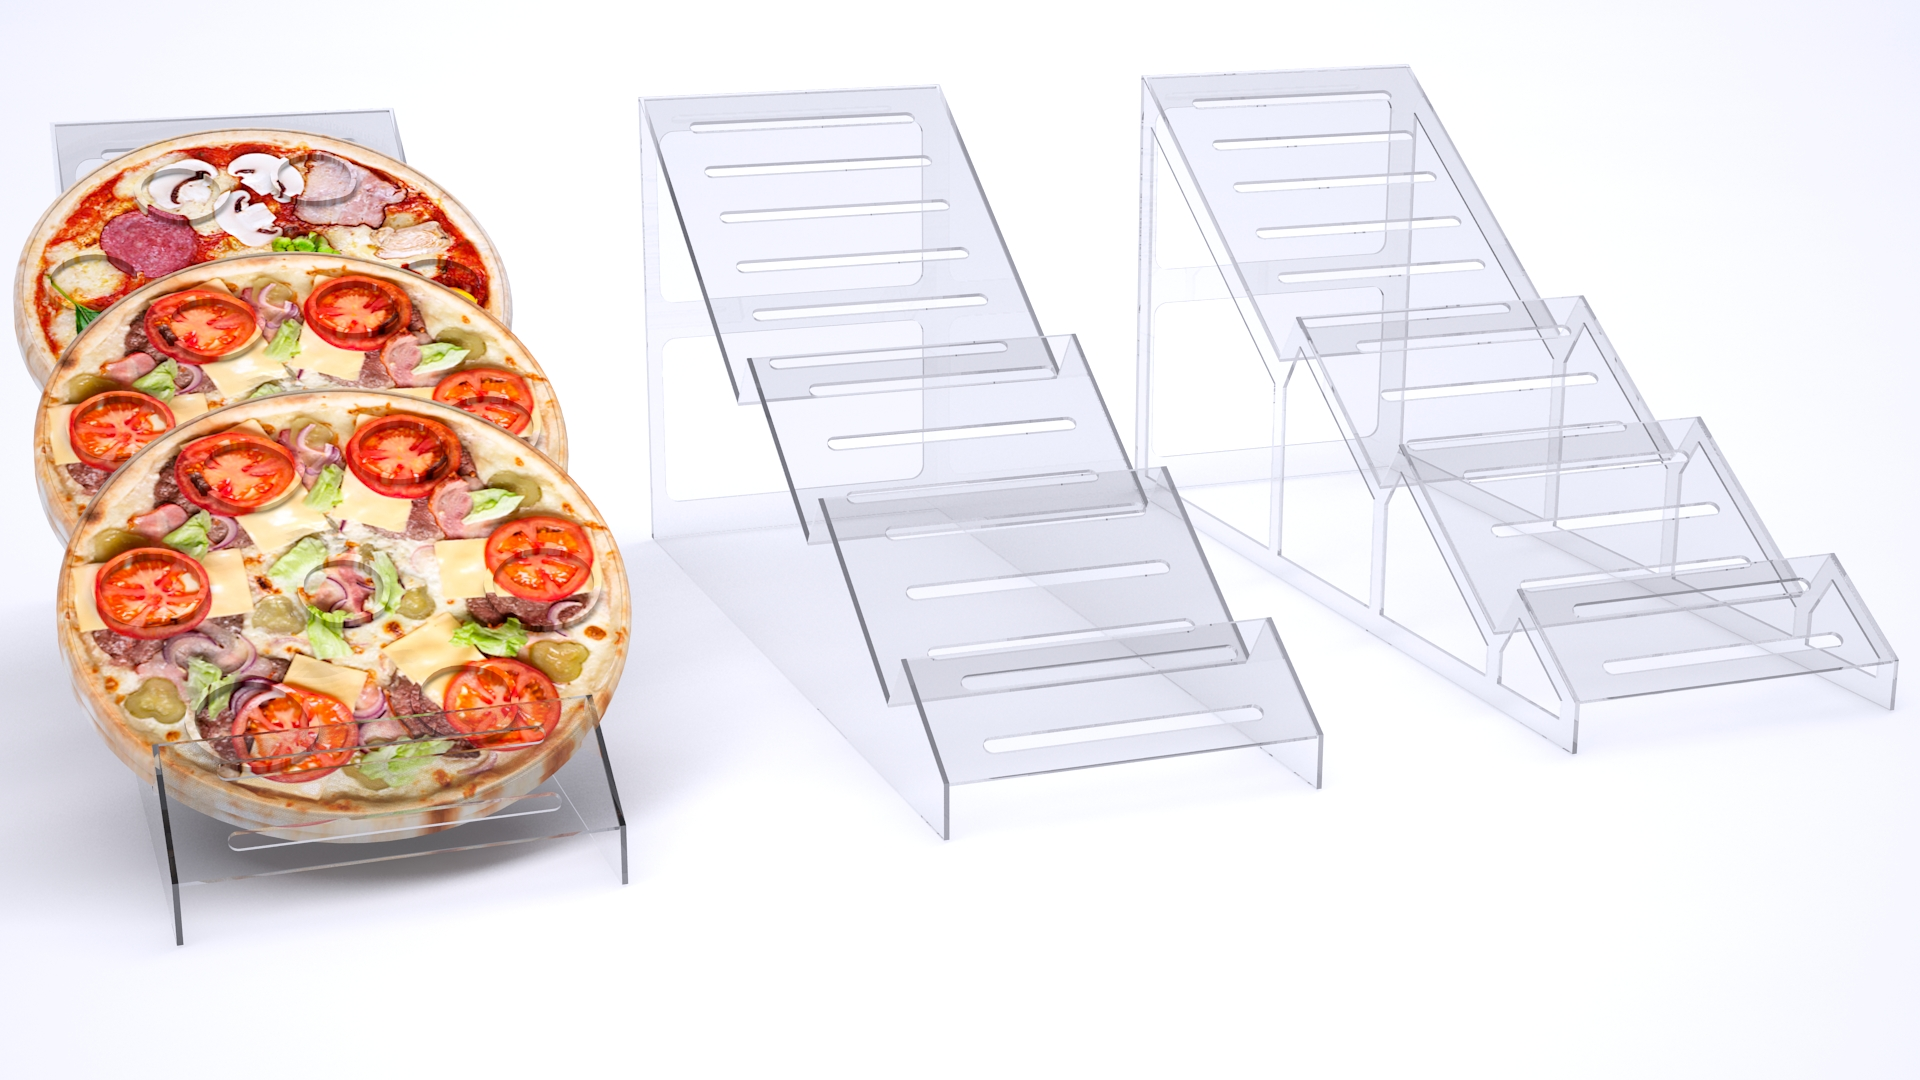 Pizza-presentatieplateau.jpg